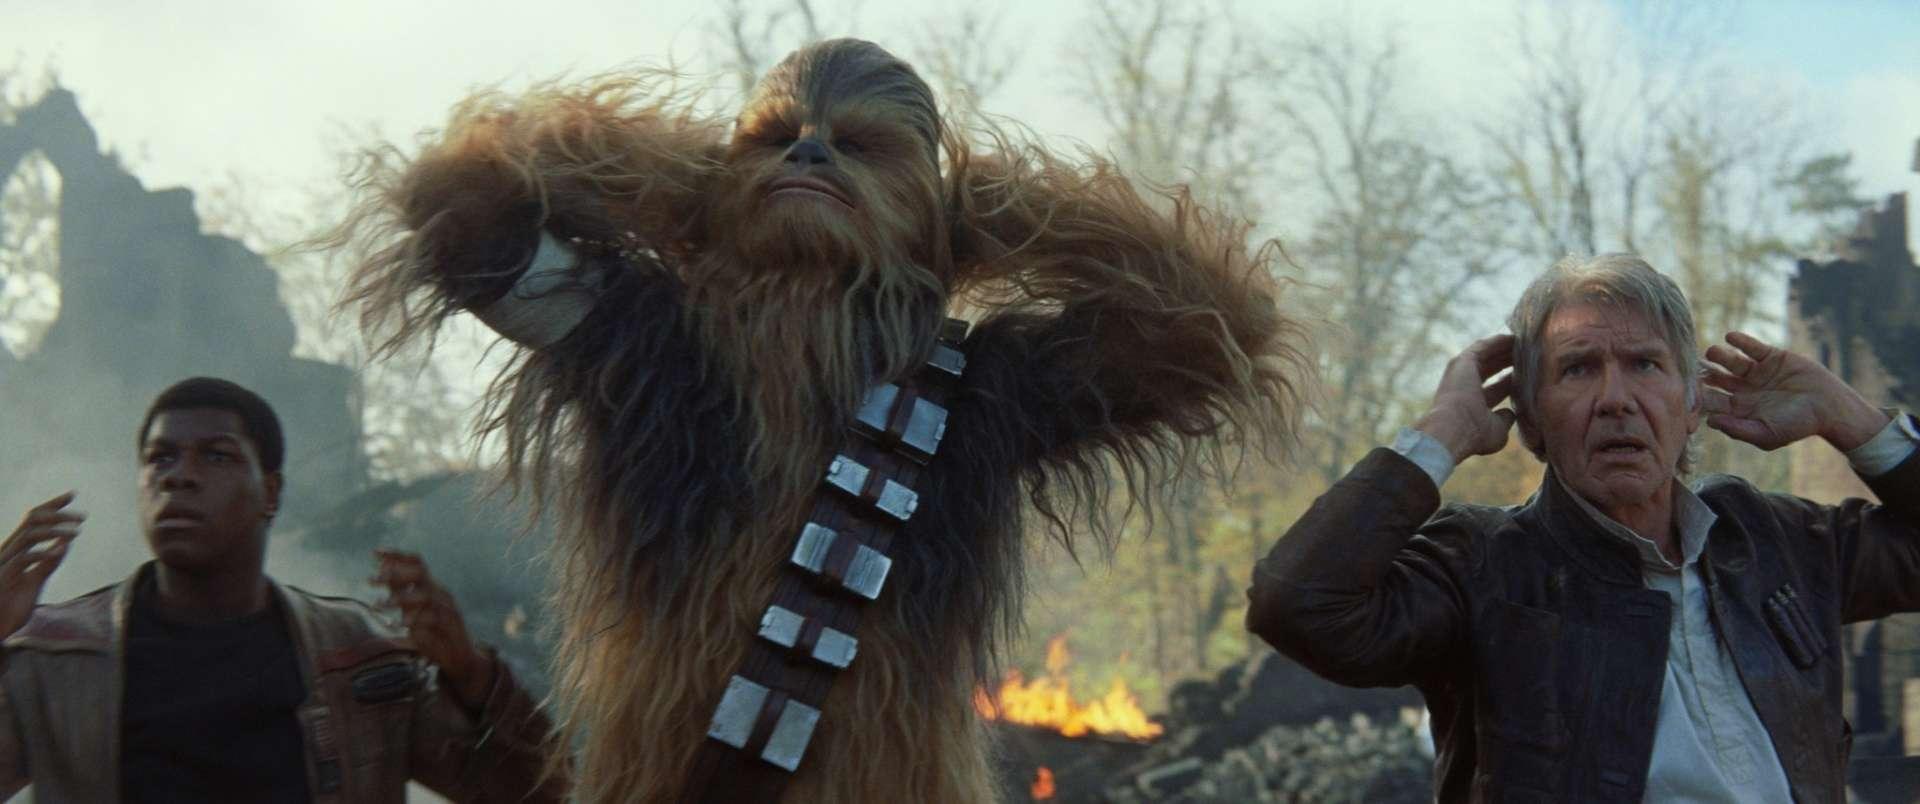 Star Wars Episode VII The Force Awakens Wallpaper 063